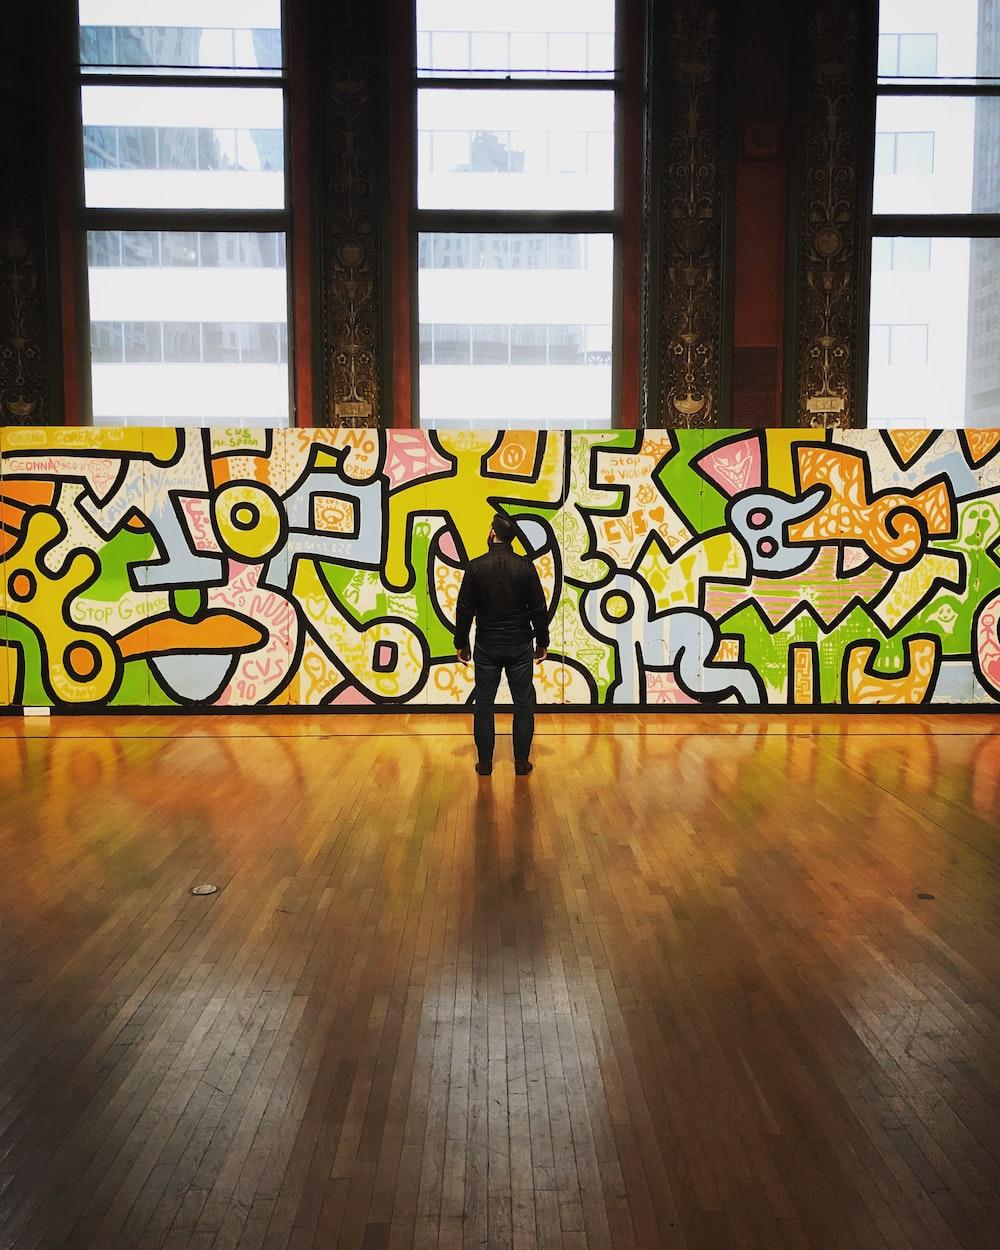 man wearing black jacket and pants facing multicolored graffiti